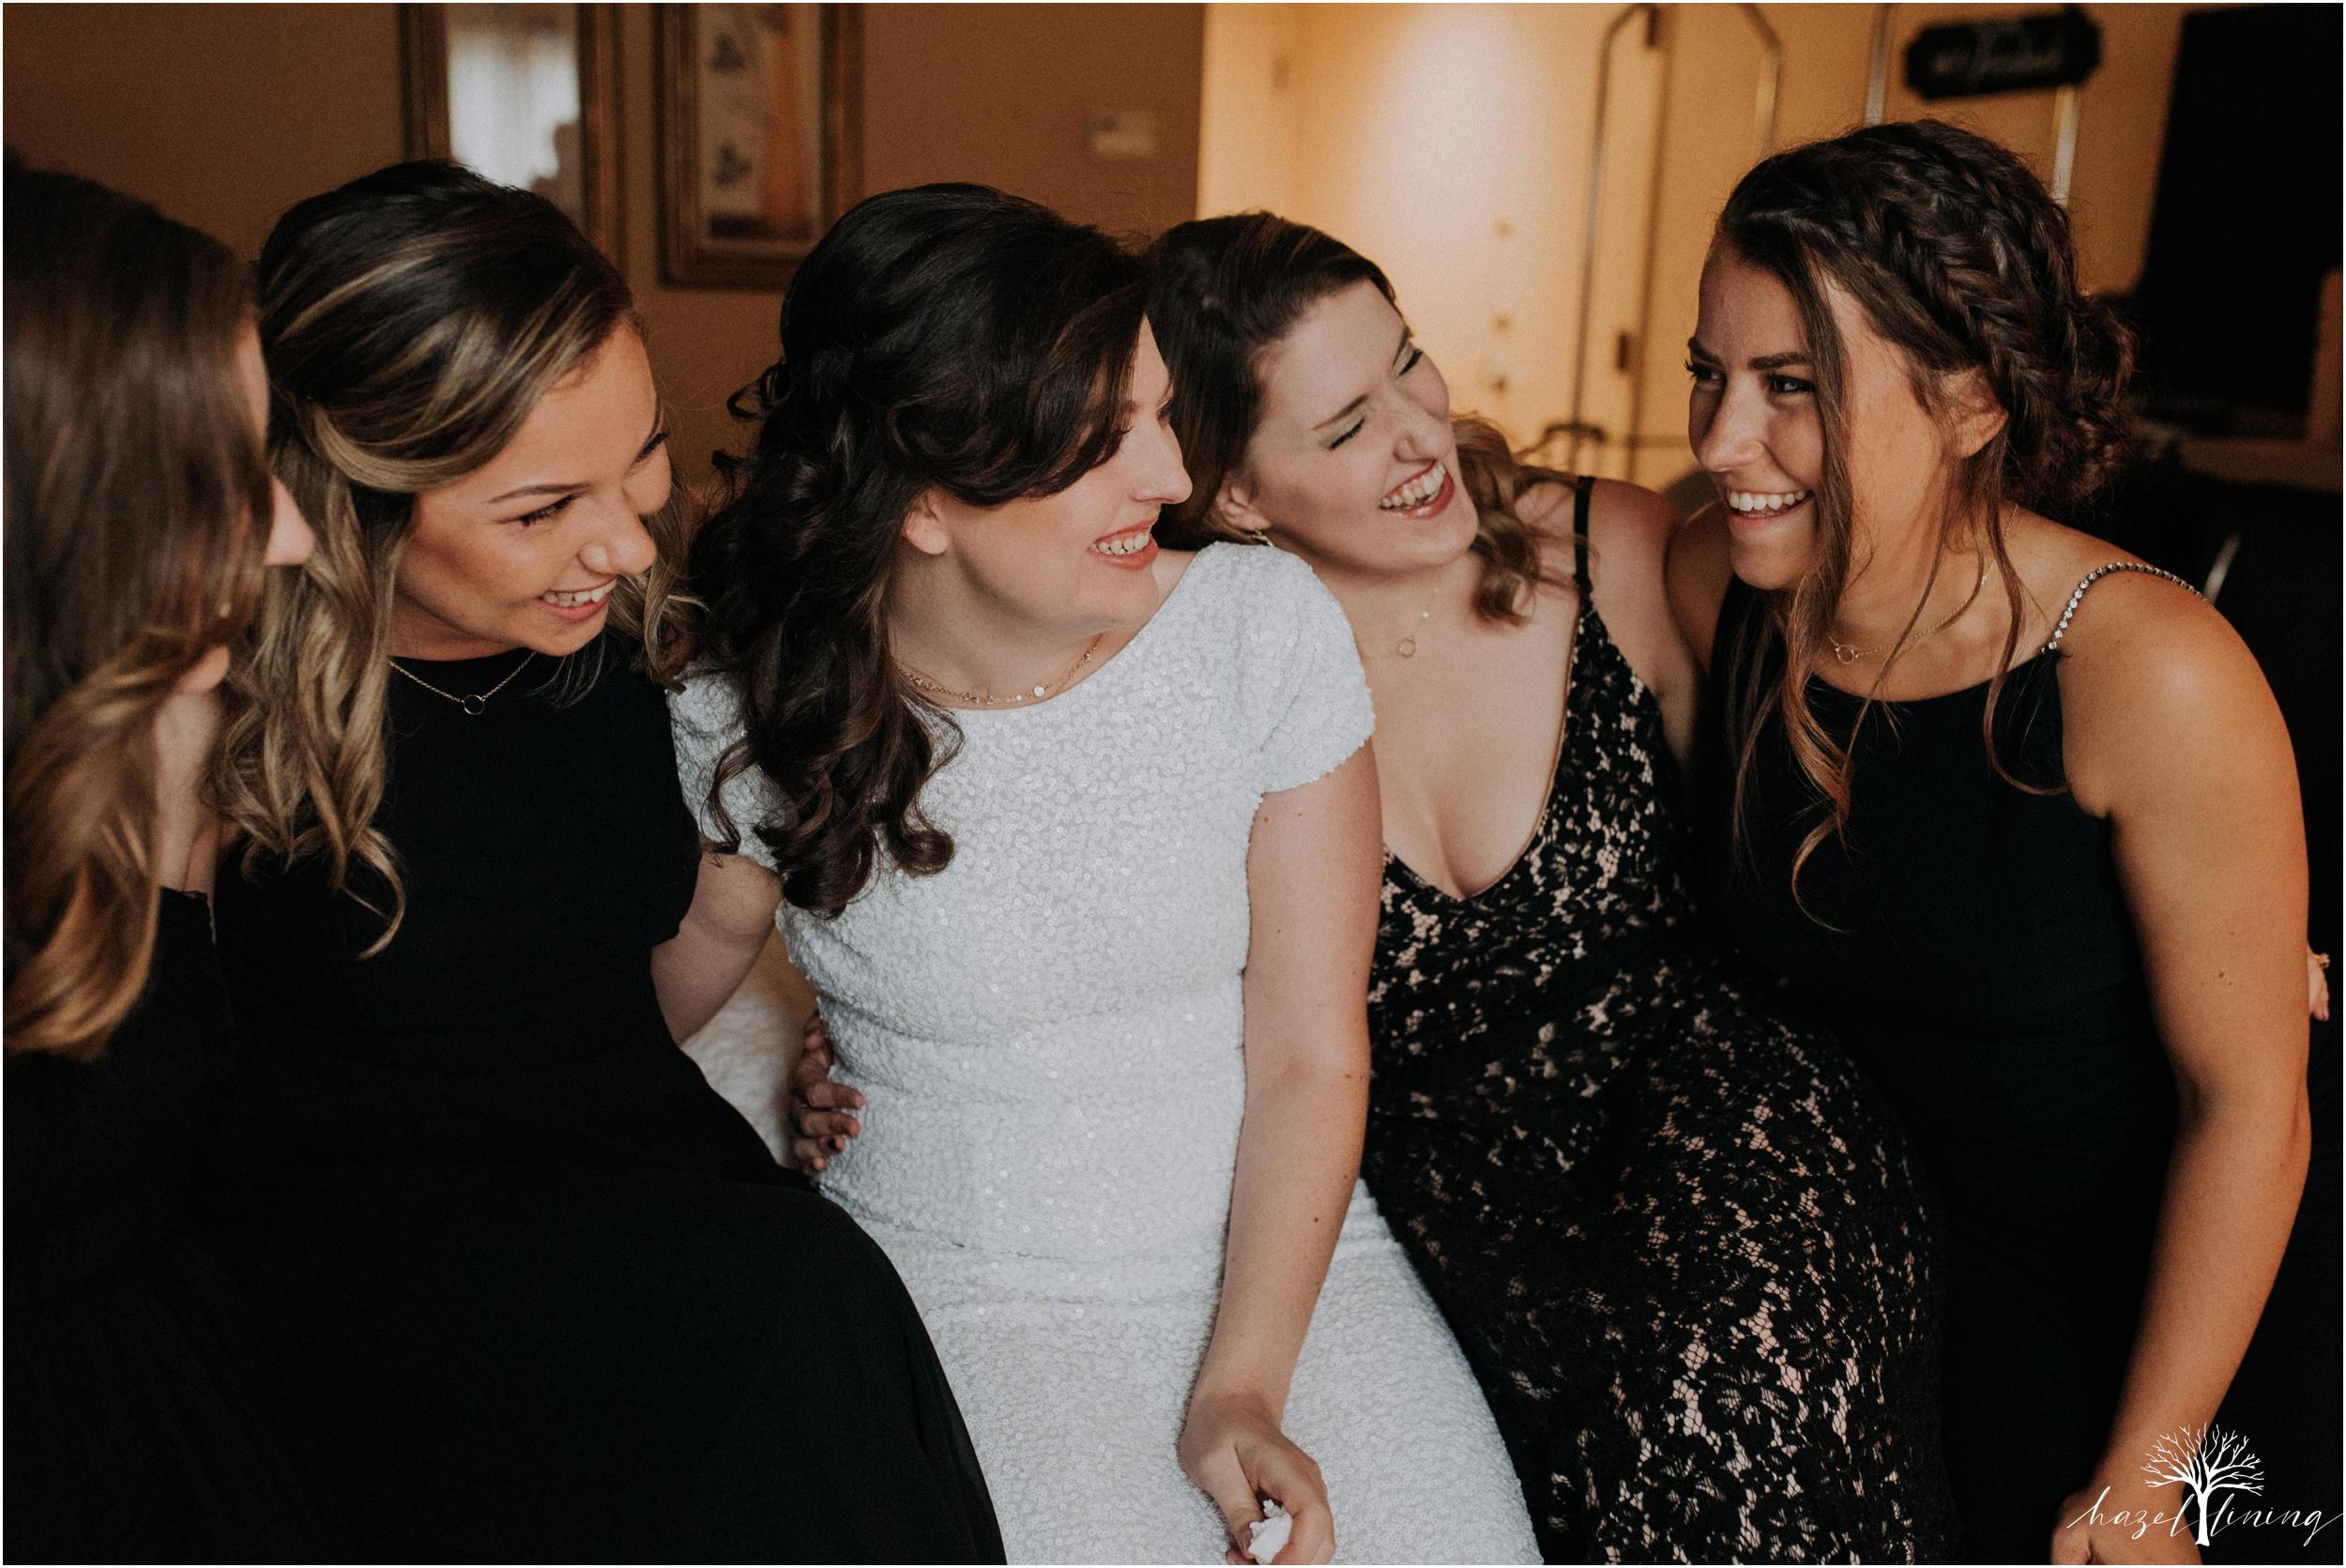 elizabeth-doelp-andrew-foreback-middletown-country-club-summer-langhorne-pennsylvania-wedding-hazel-lining-travel-wedding-elopement-photography_0021.jpg